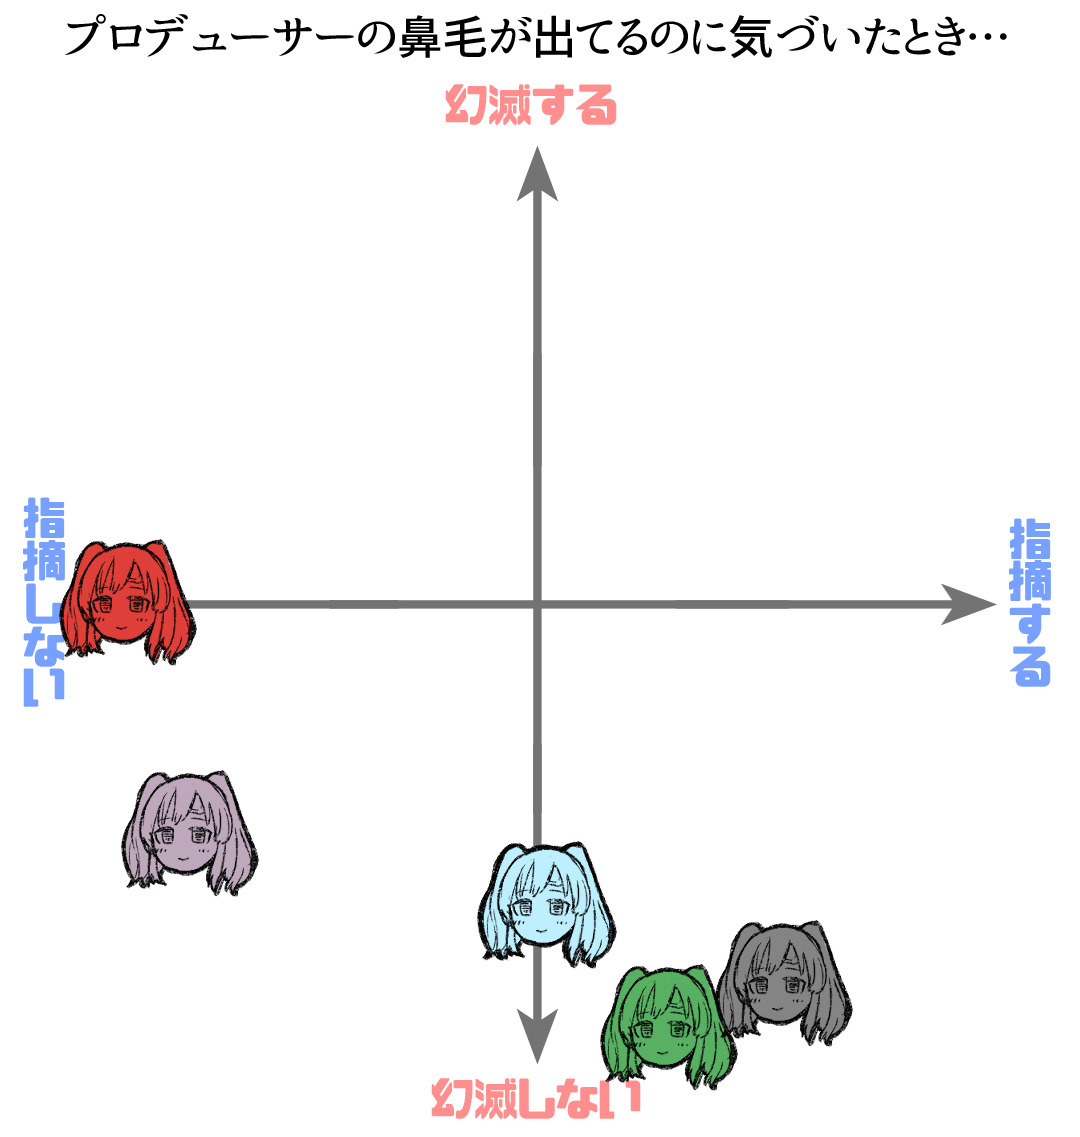 f:id:hoshi_sano:20200414112747j:image:w400